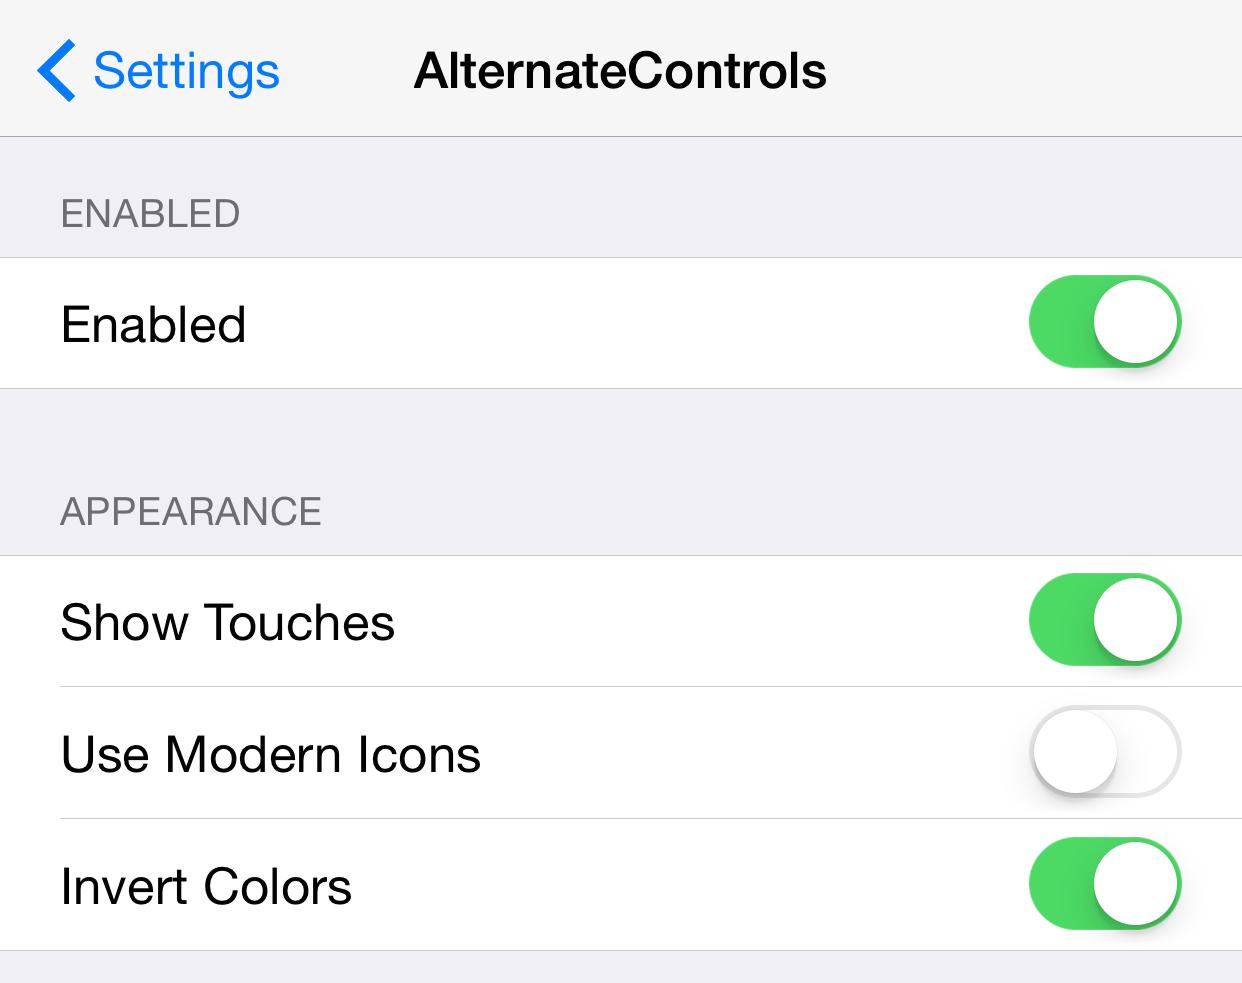 AlternateControls Settings